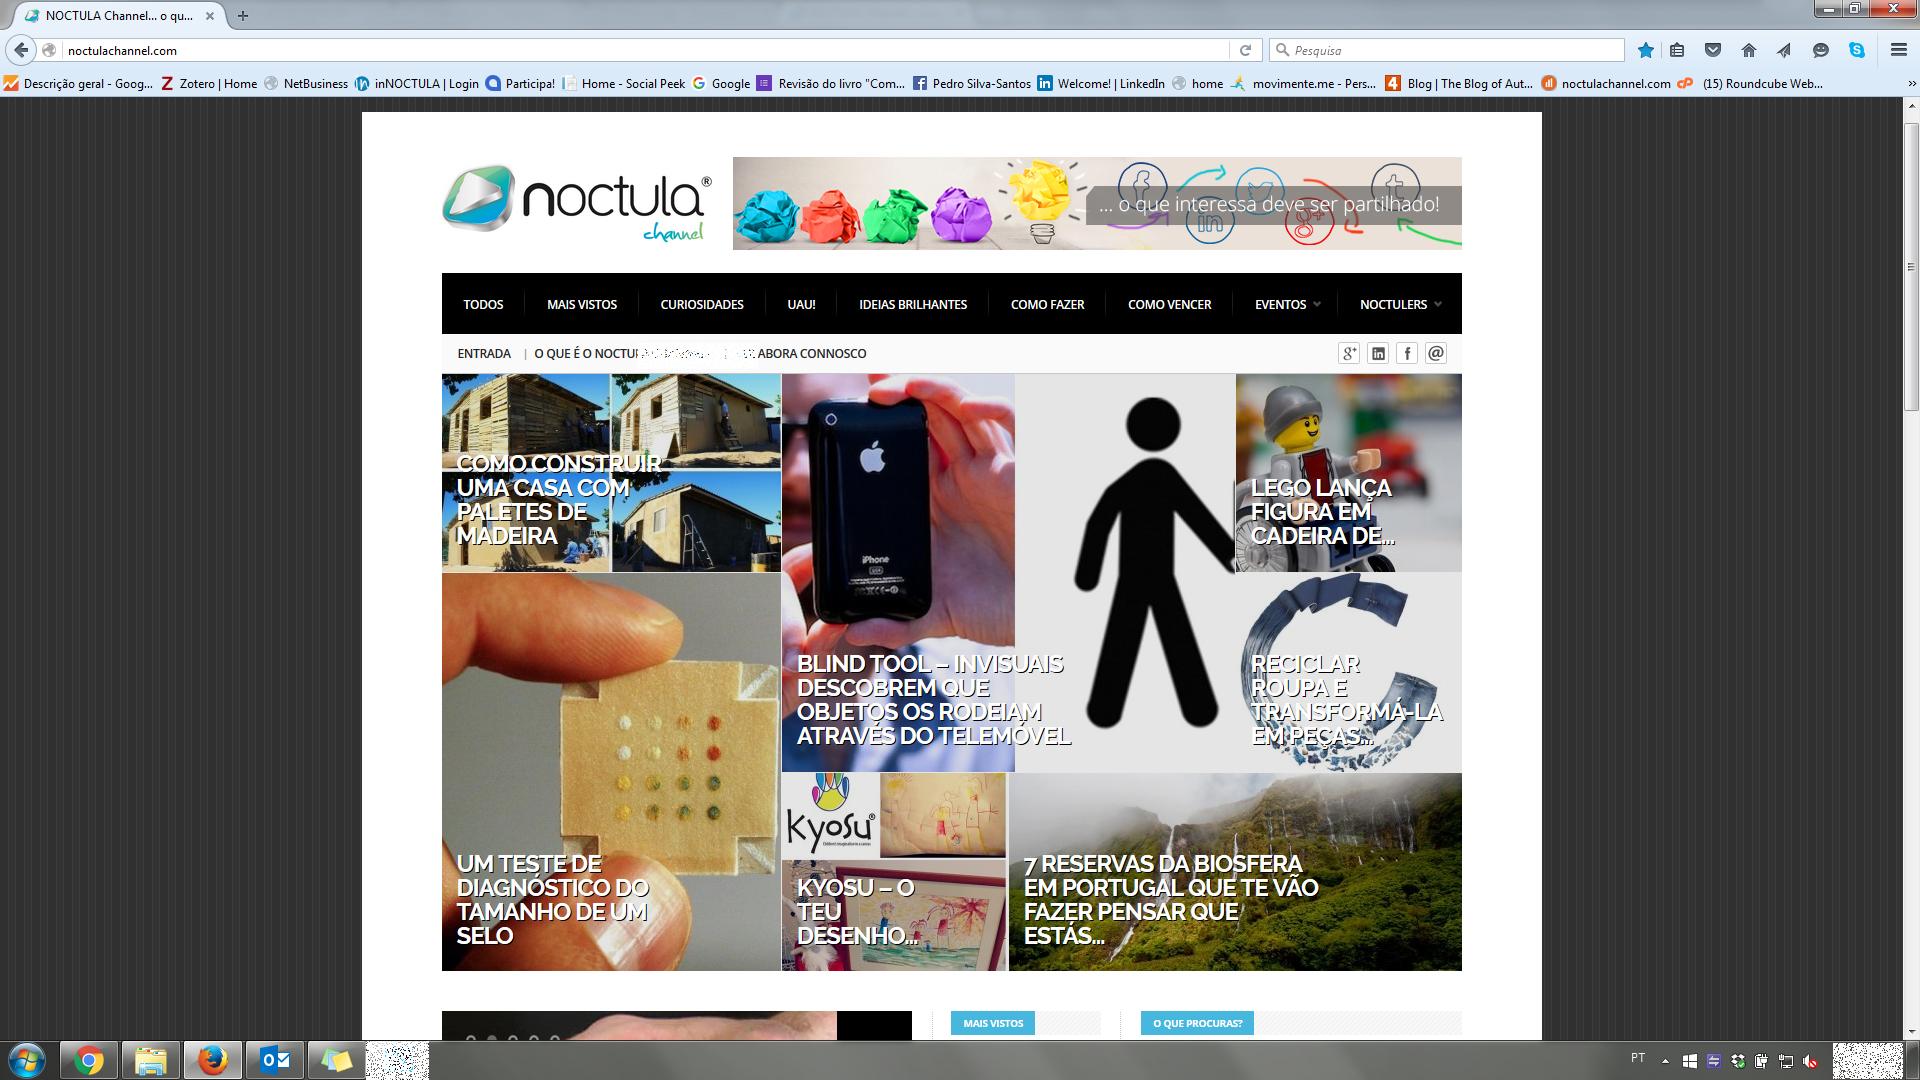 portal NOCTULA Channel - o que interessa deve ser partilhado